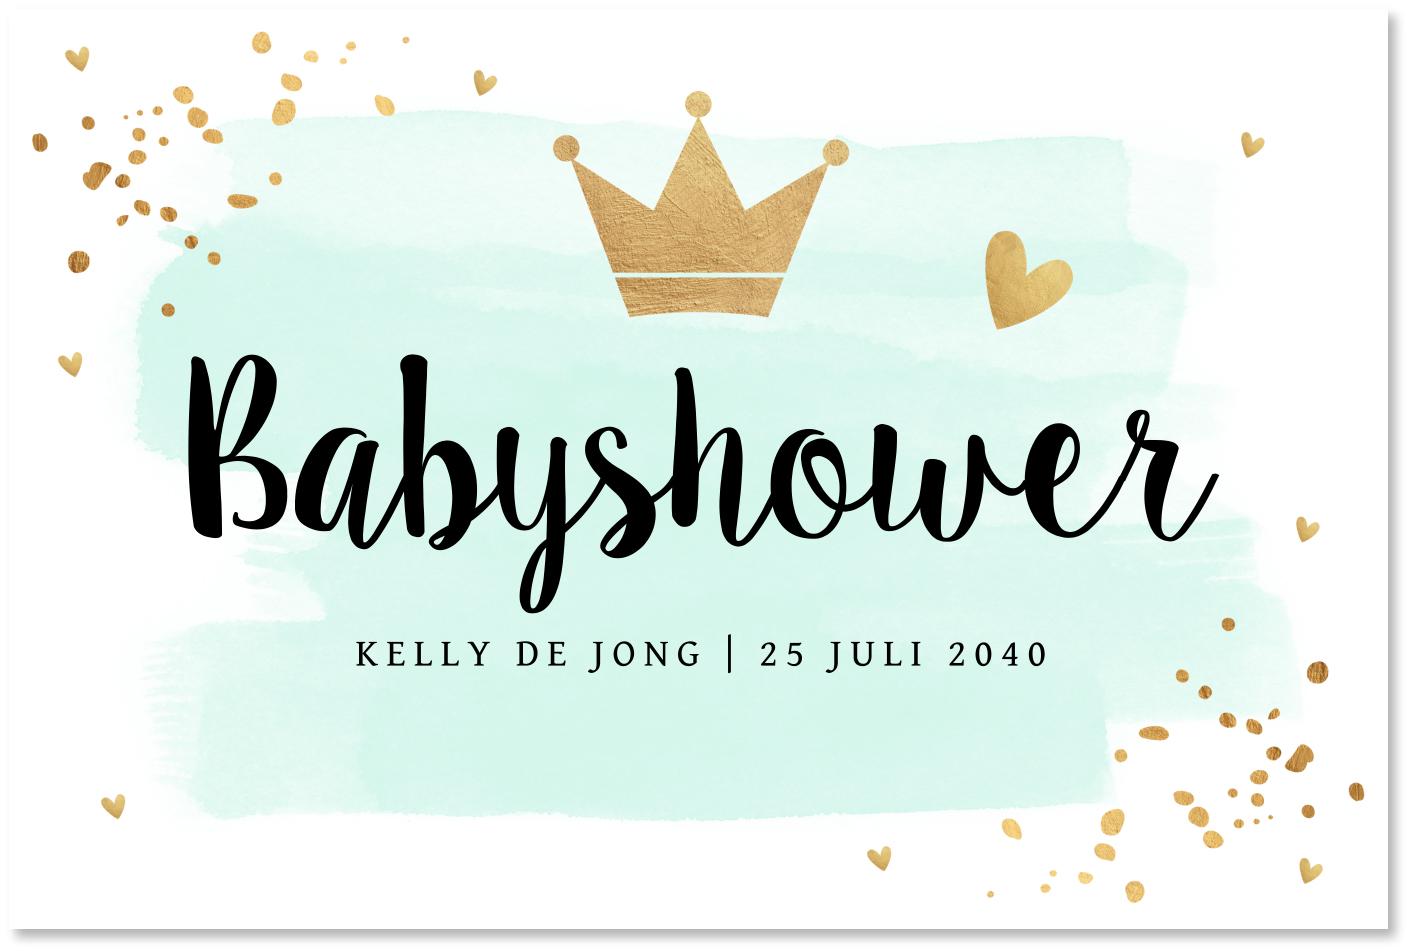 Babyshower waterverf mintgroen